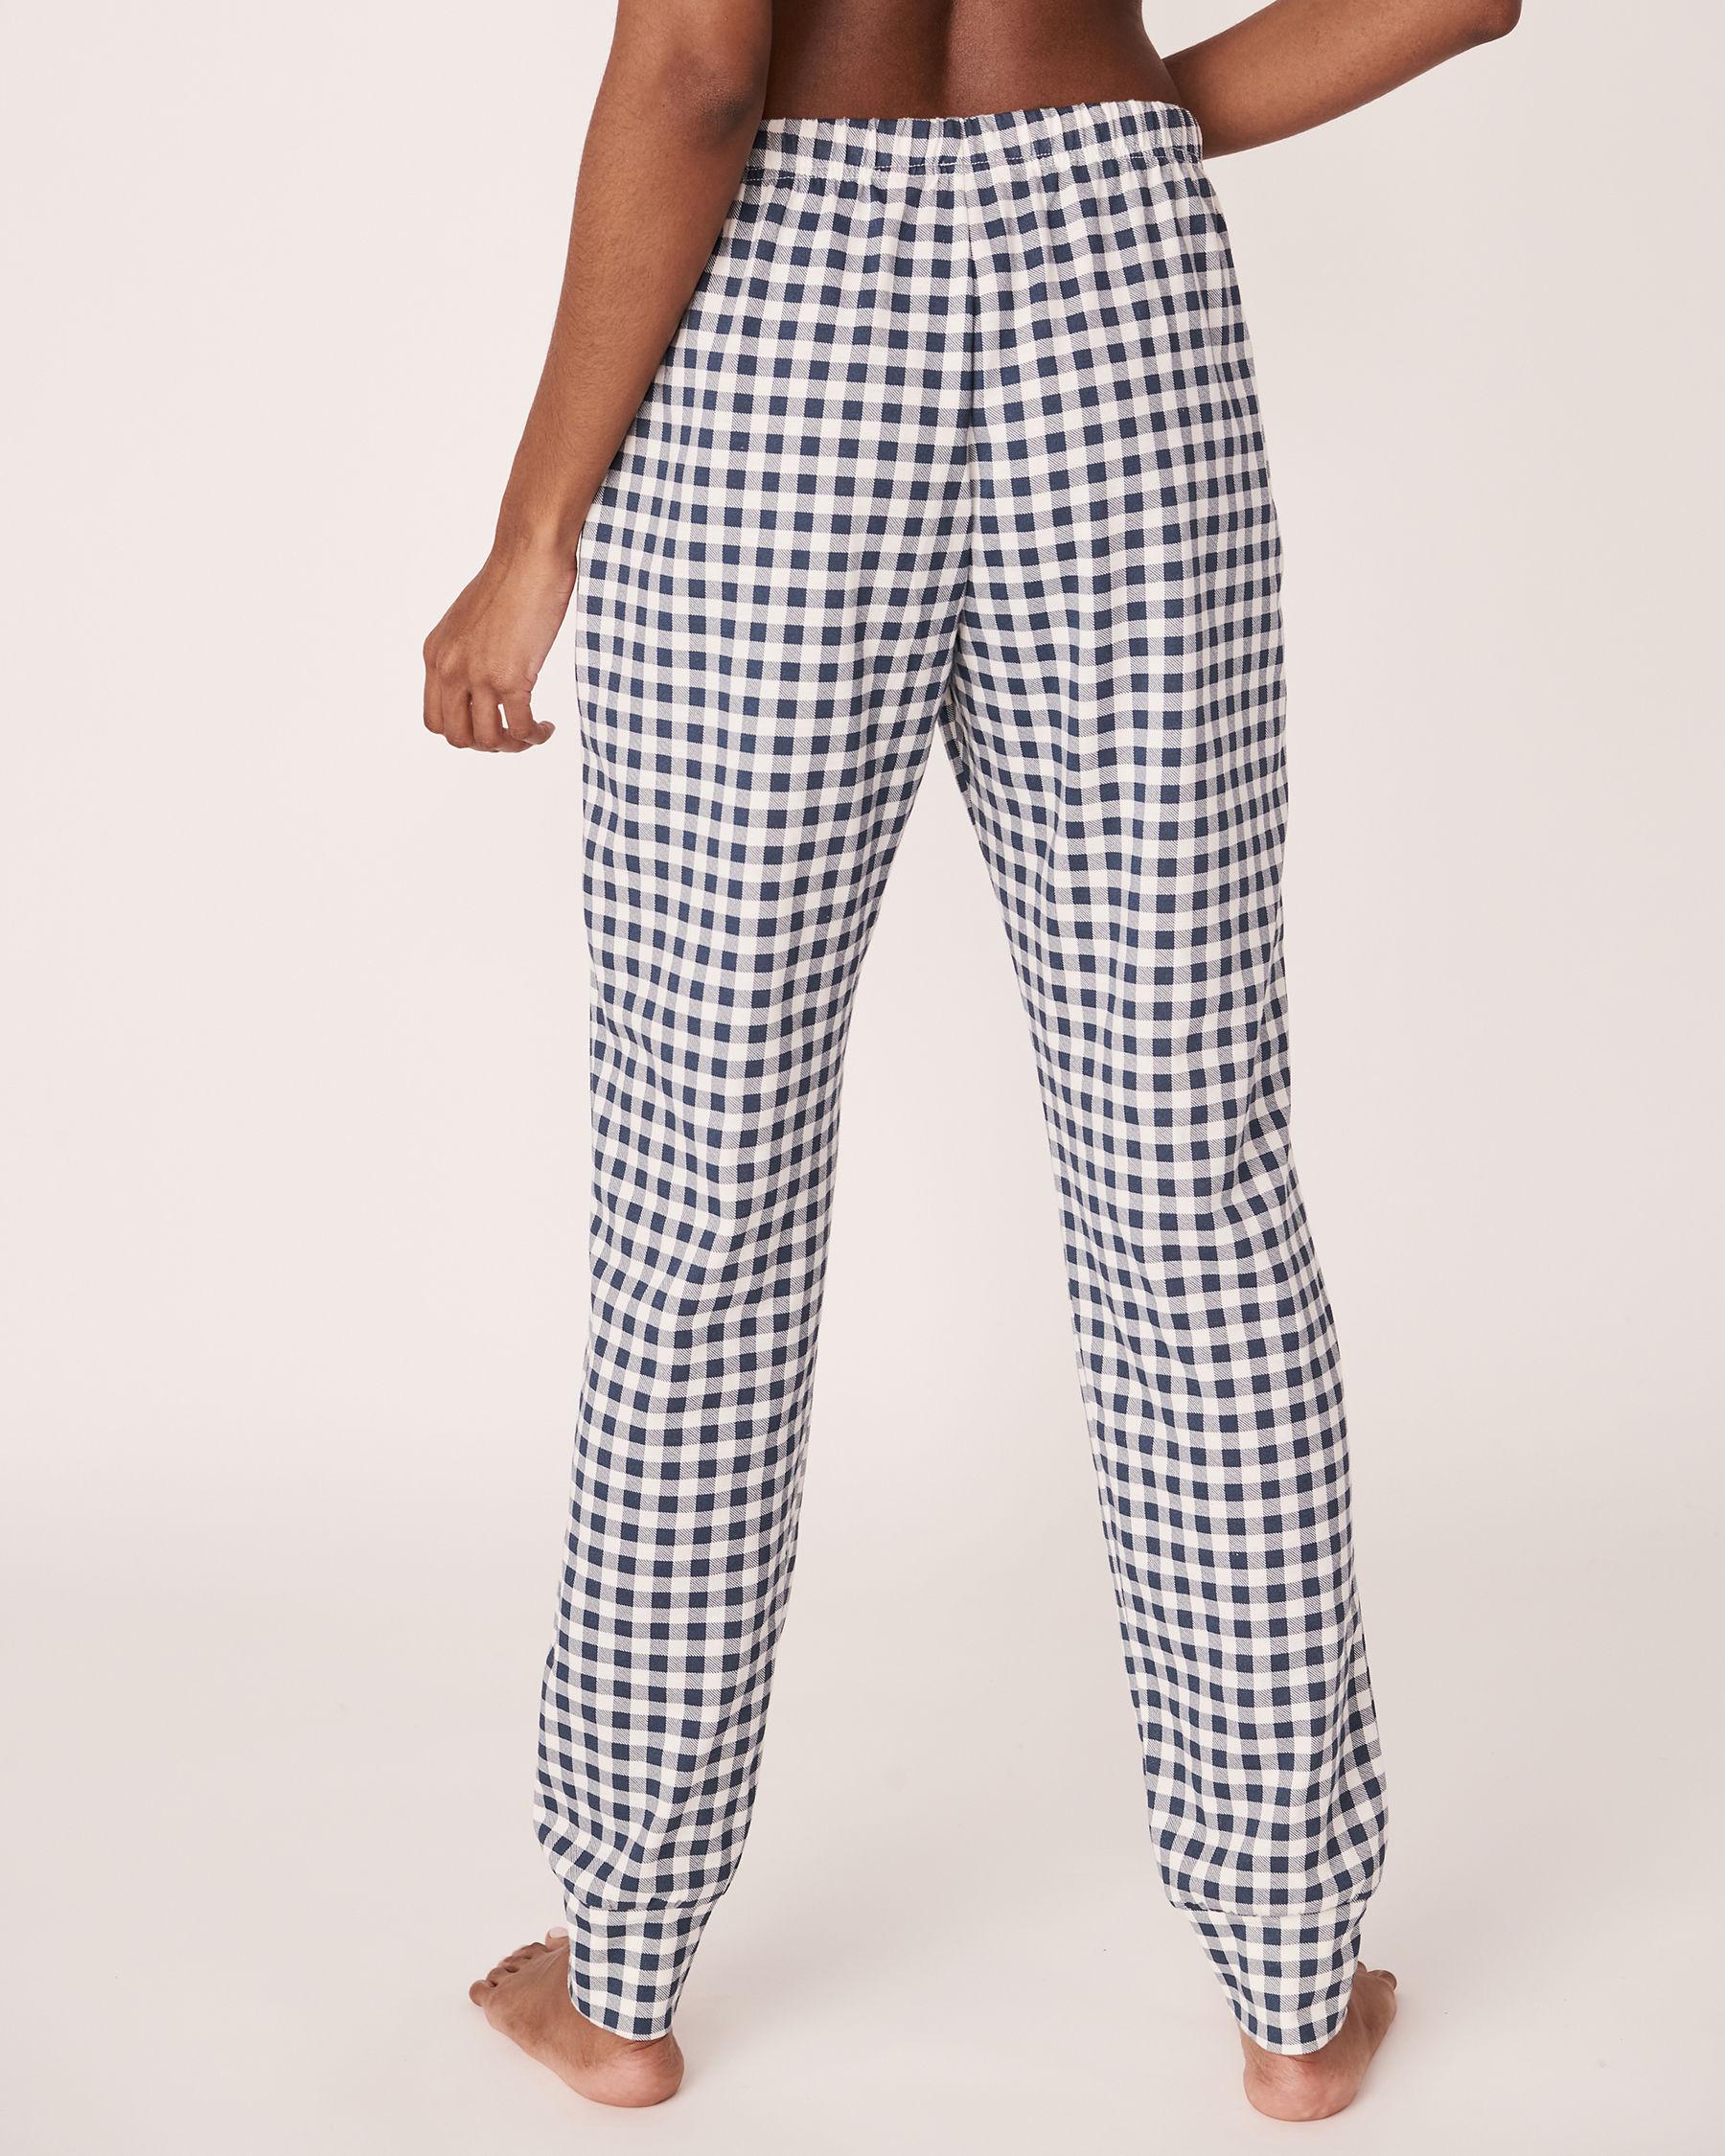 LA VIE EN ROSE Pantalon de pyjama ajusté Vichy marine 40200109 - Voir2